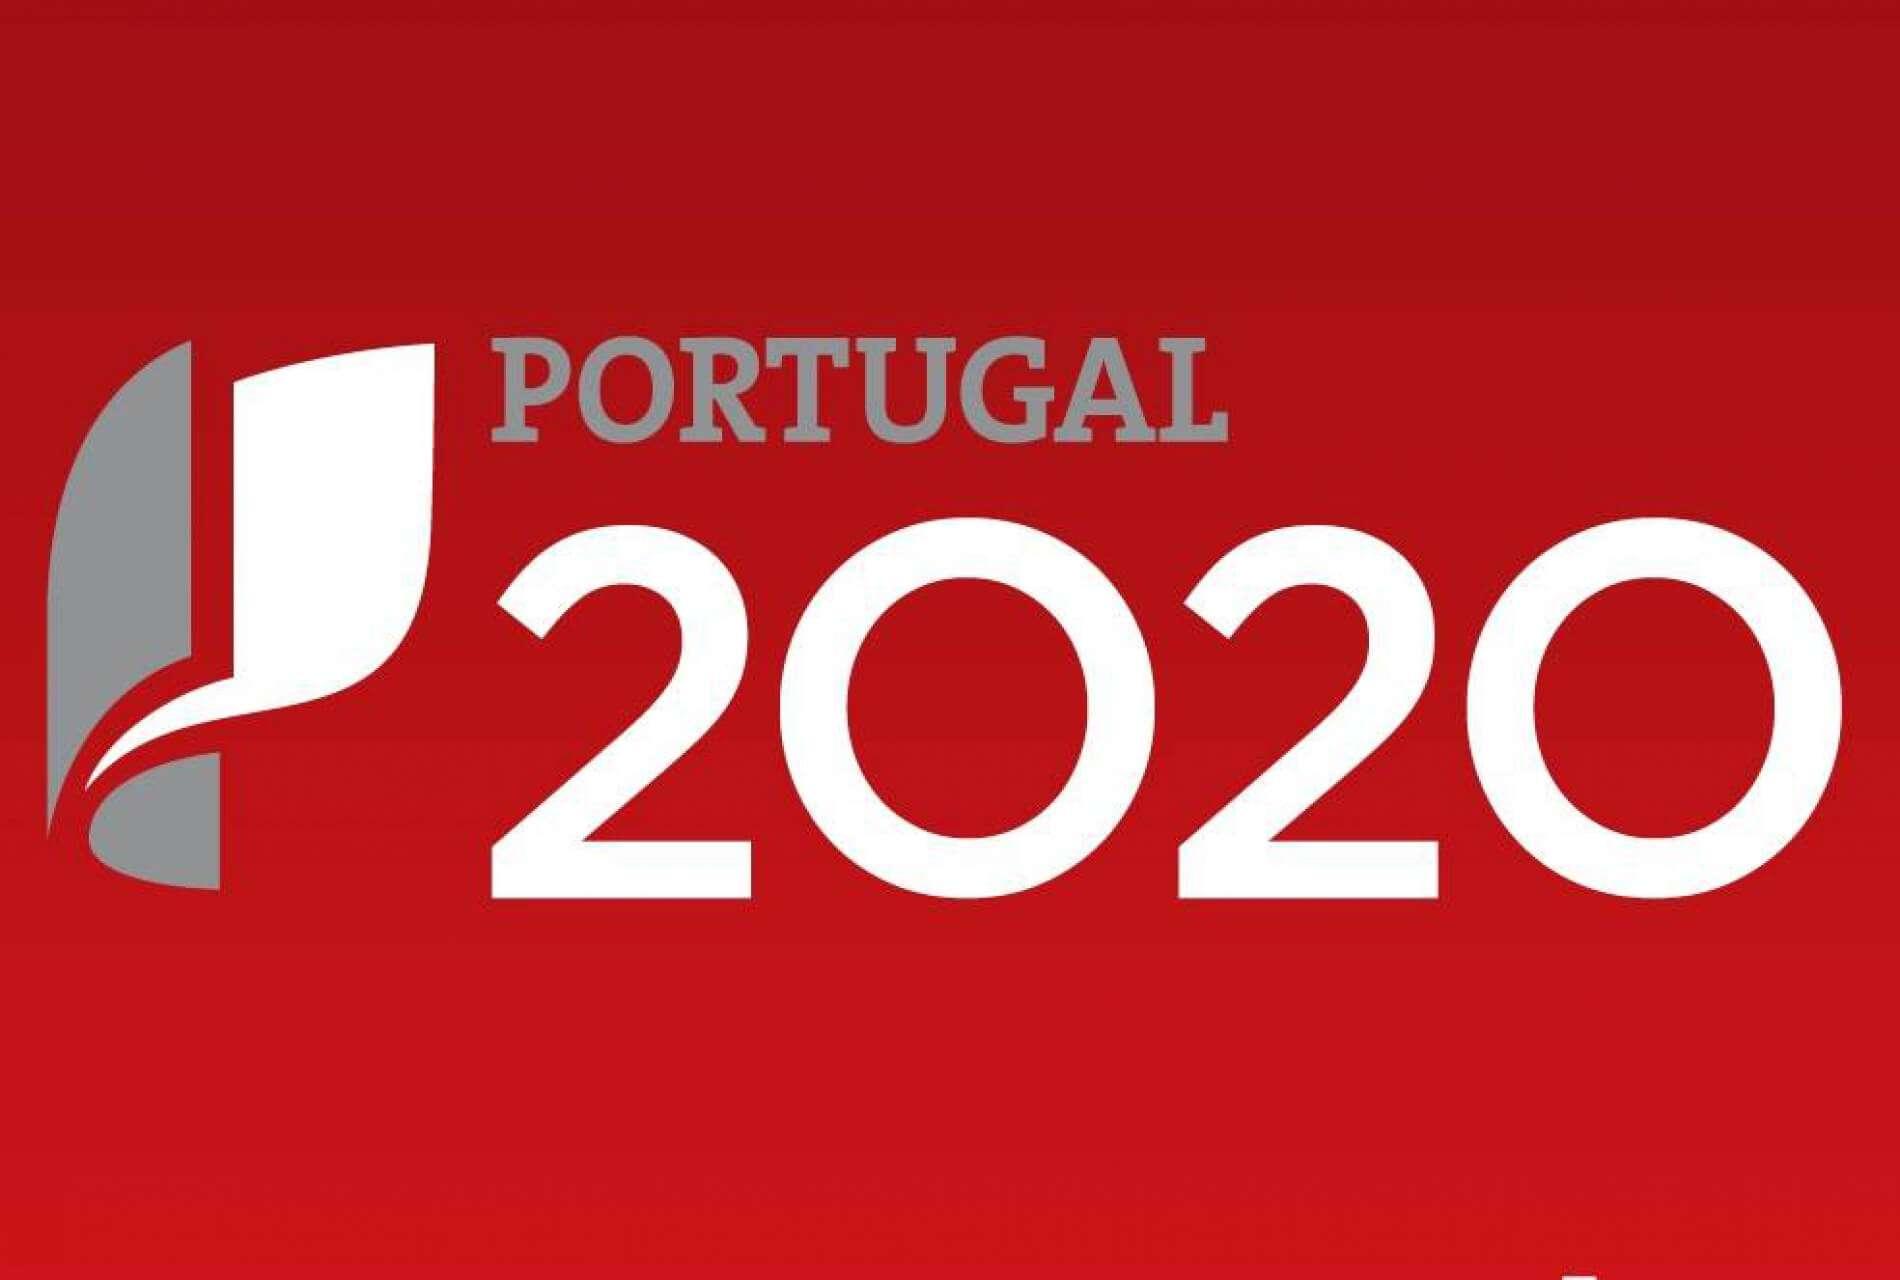 Portugal 2020 alt REWARD Consulting